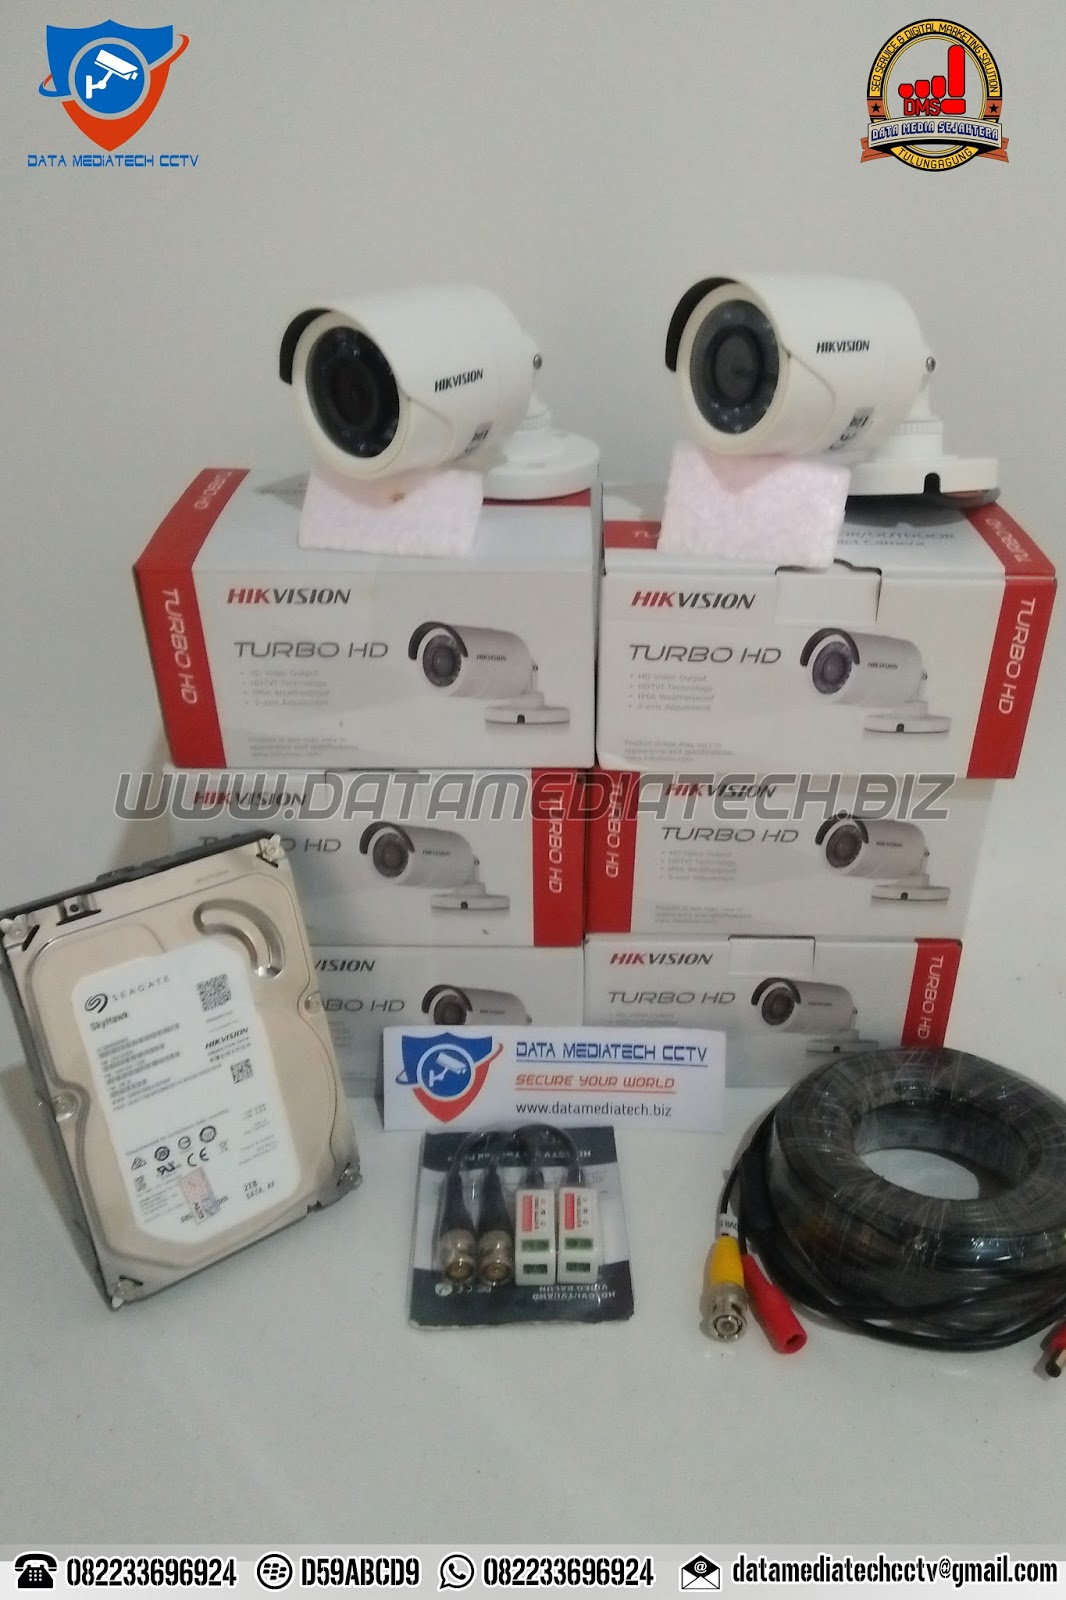 Jasa Pasang Kamera CCTV Terpercaya Trenggalek Kota